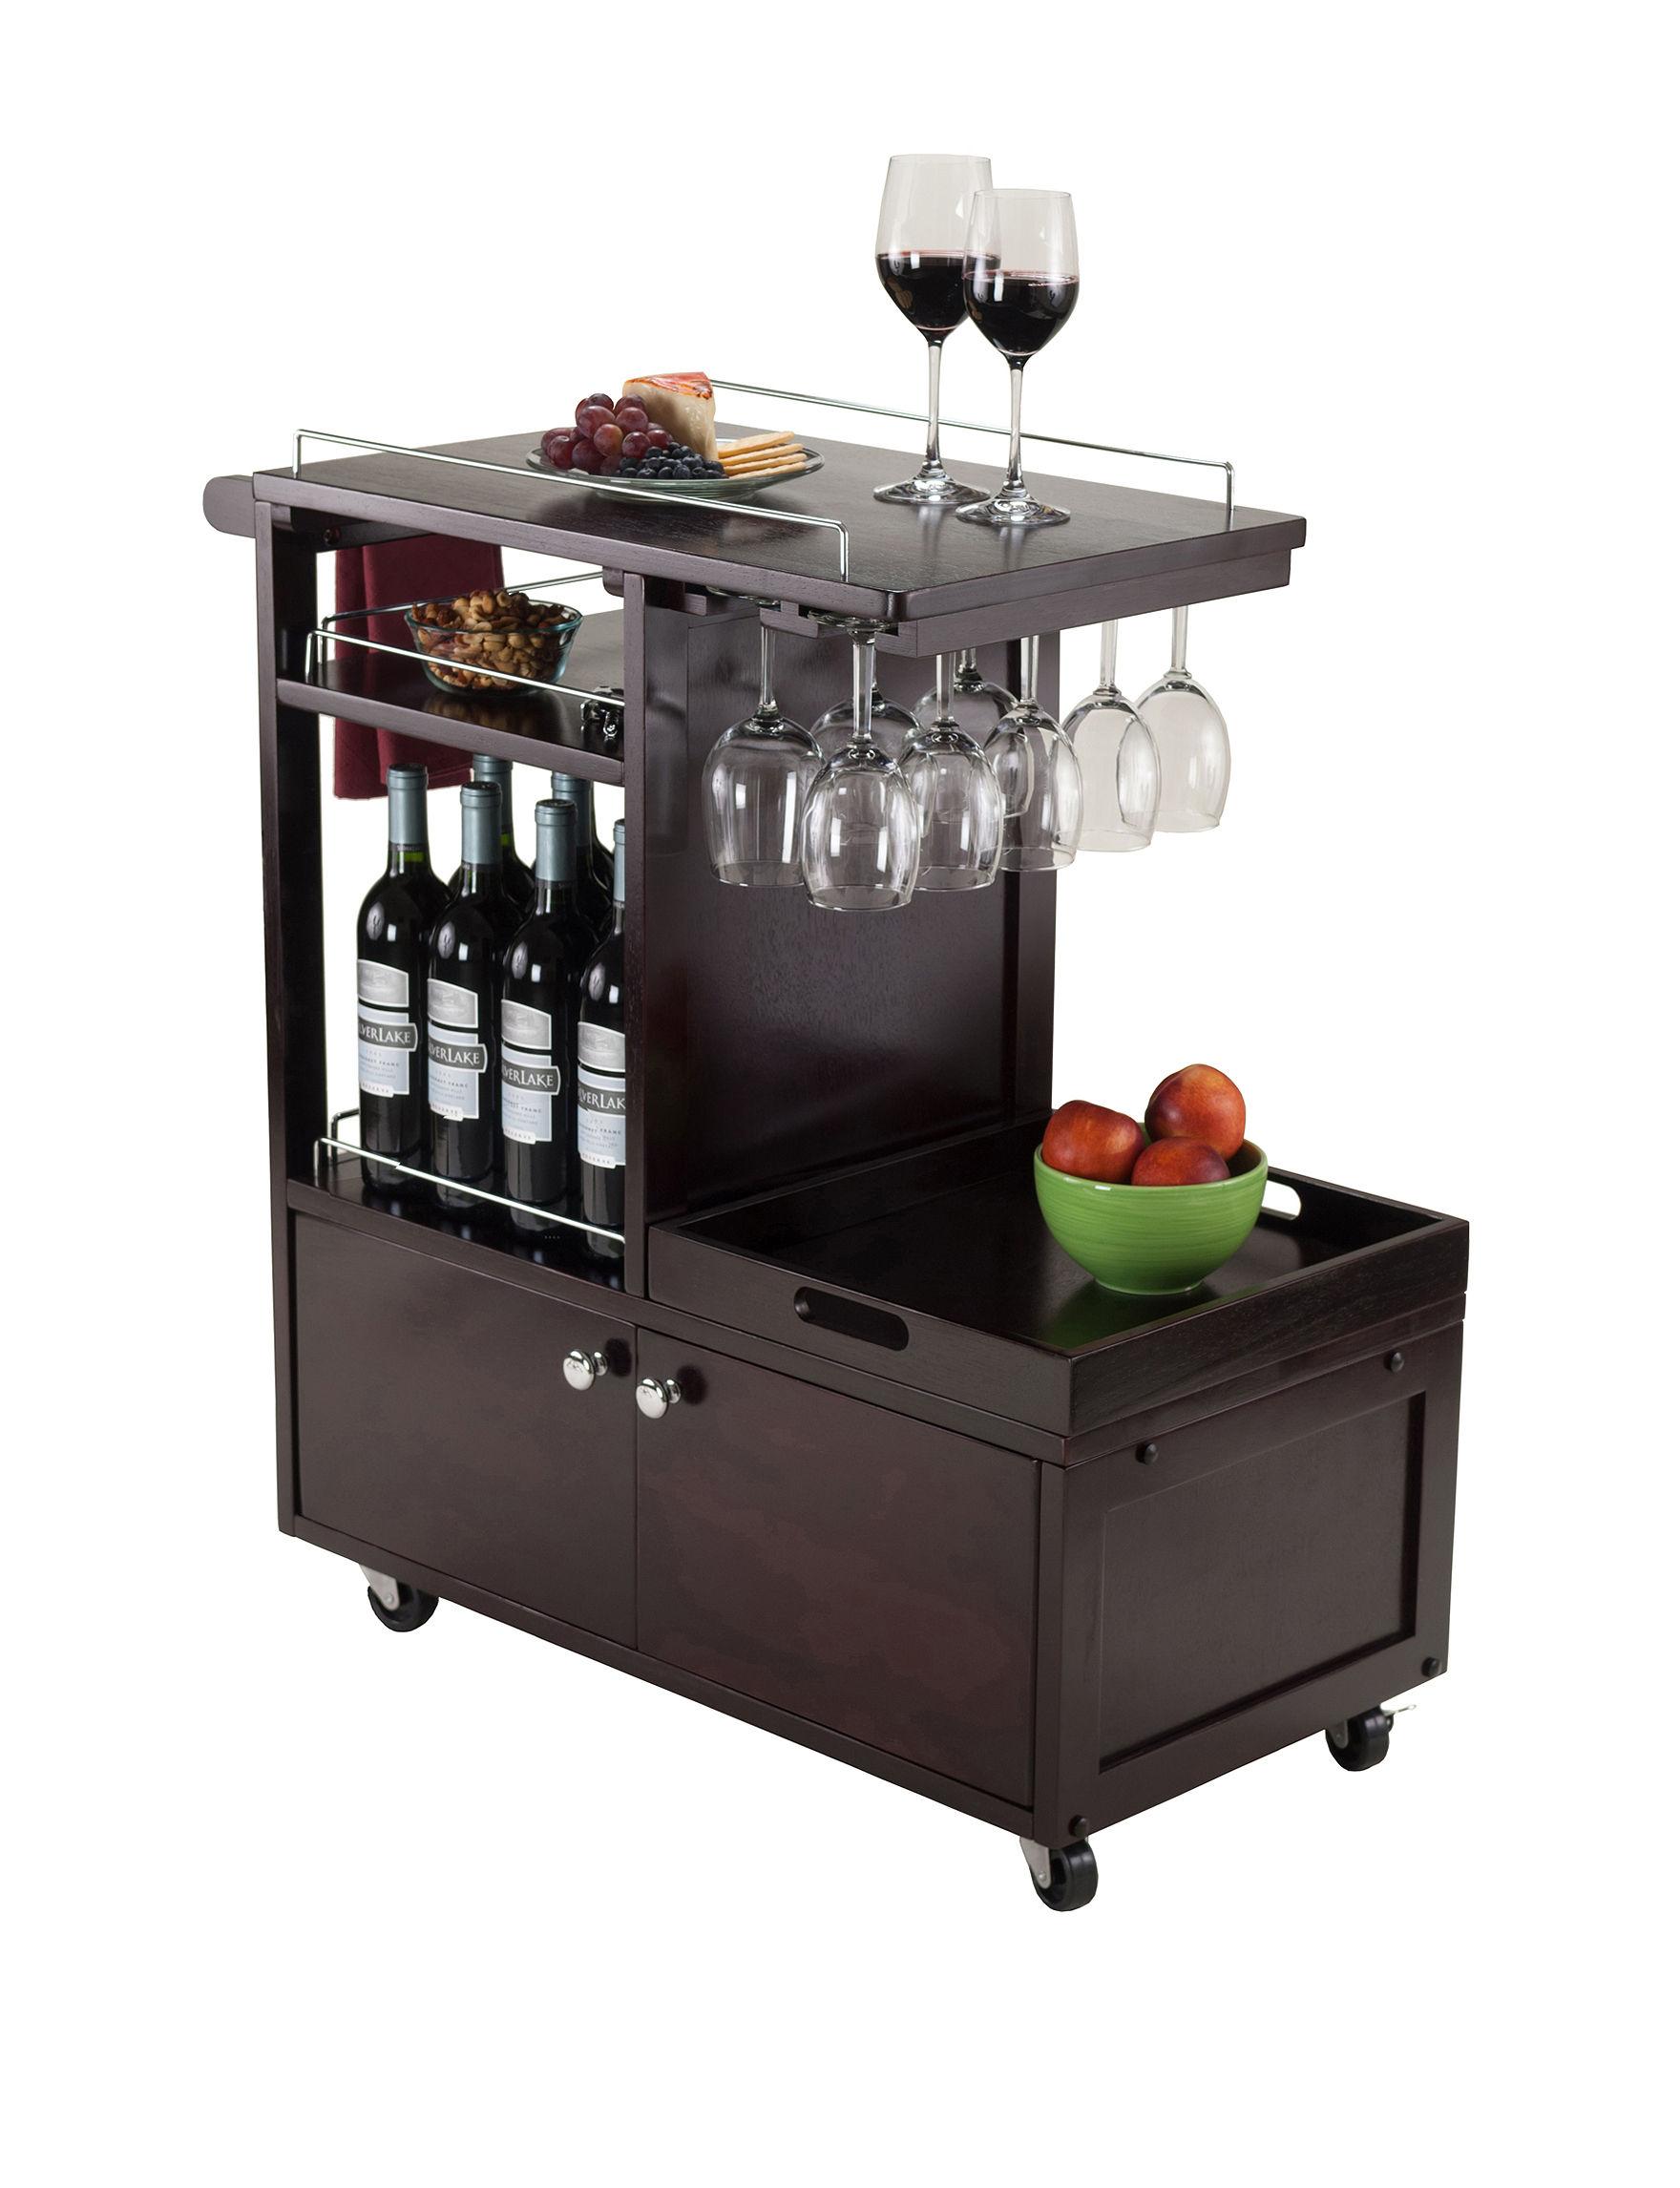 Winsome Brown Kitchen Islands & Carts Kitchen & Dining Furniture